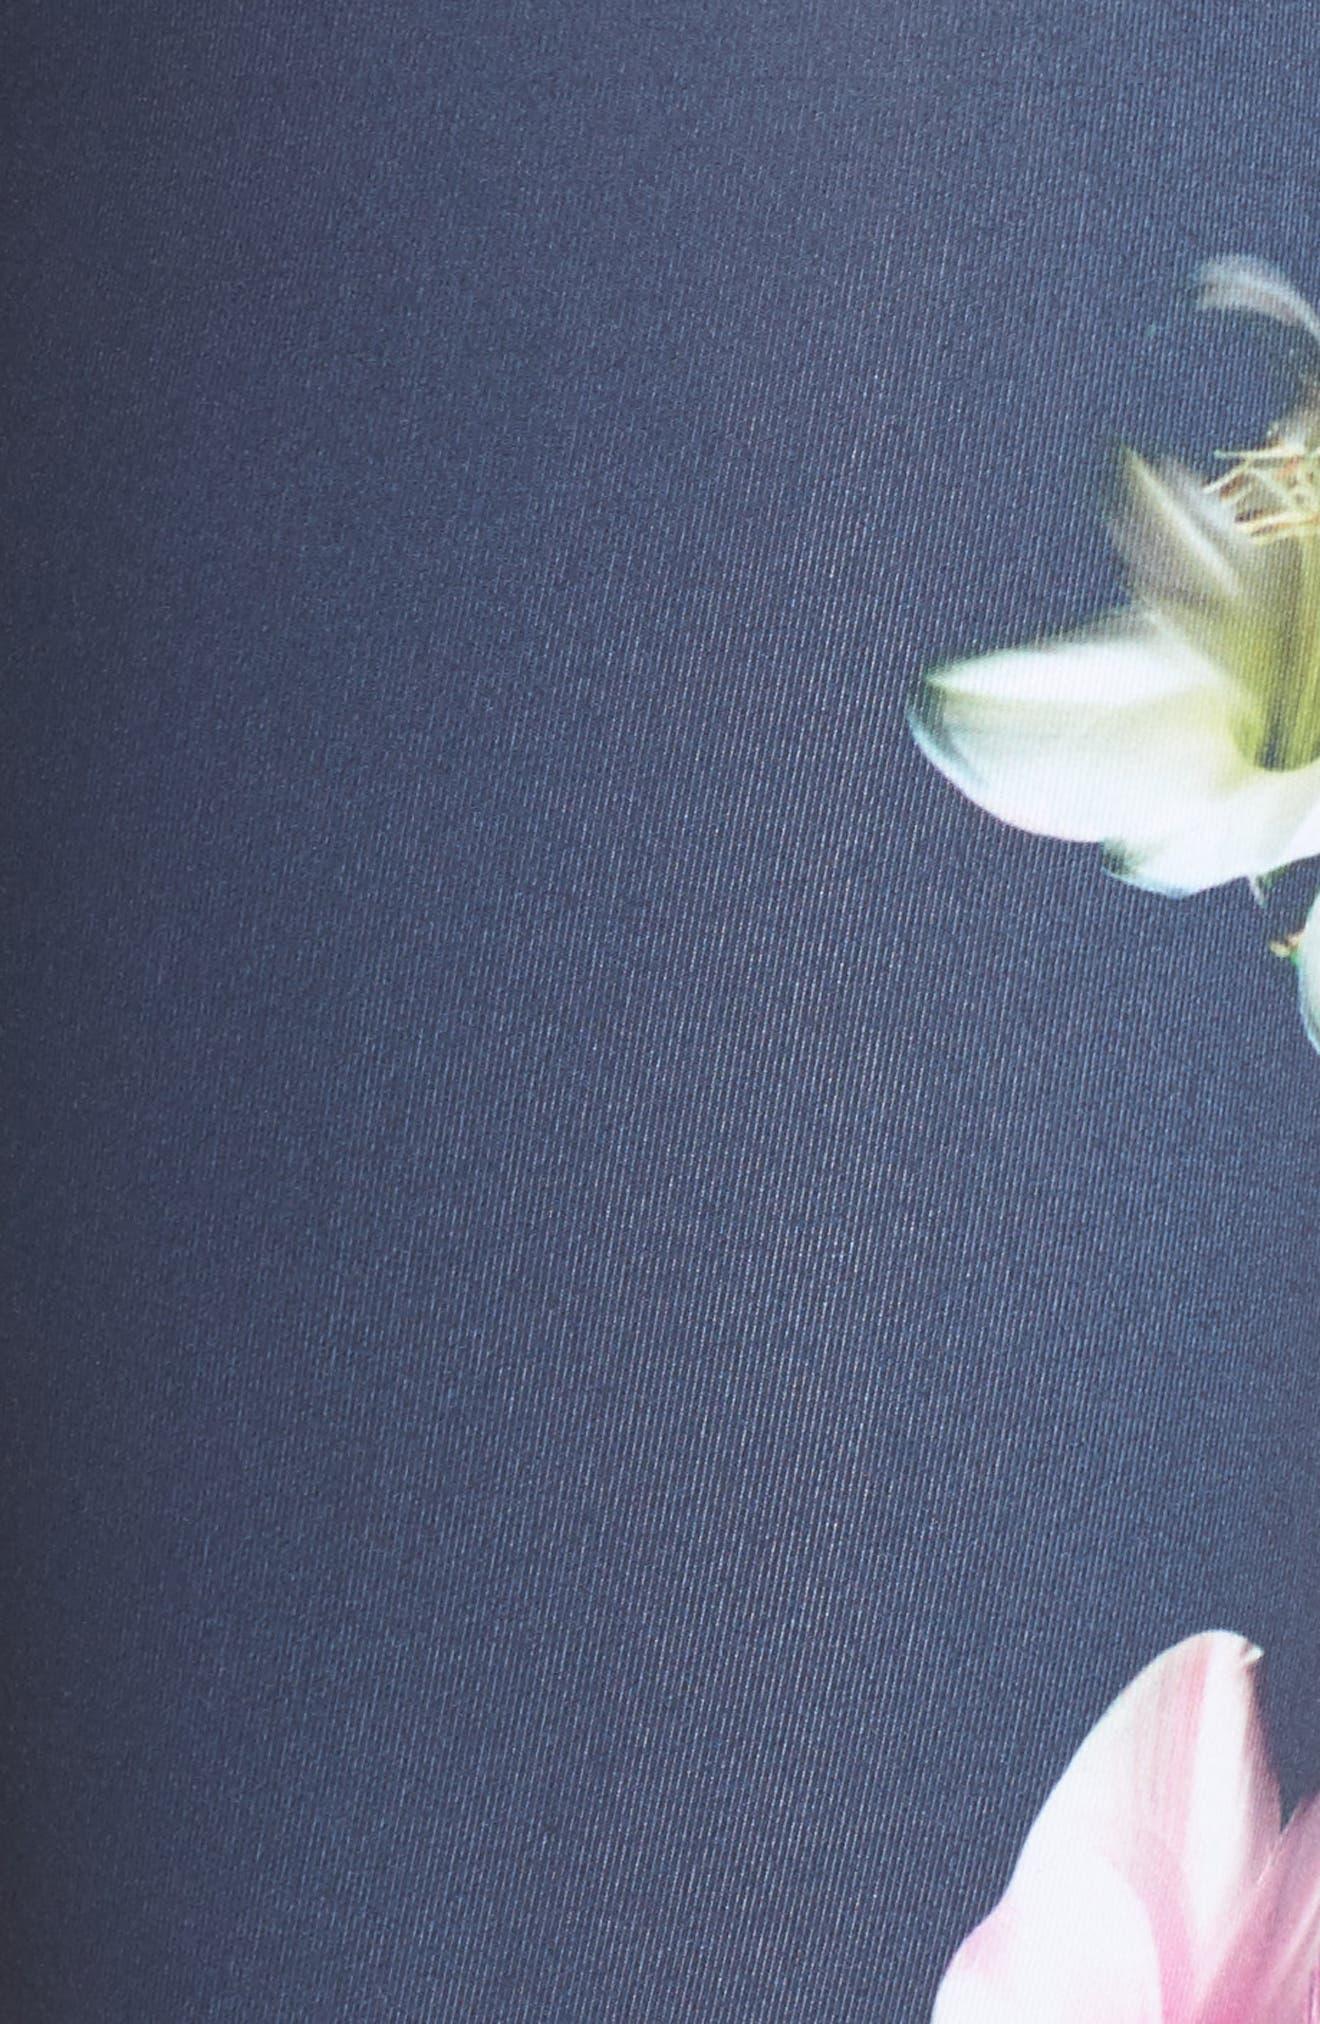 Pure Floral Ink High Waist Leggings,                             Alternate thumbnail 6, color,                             021